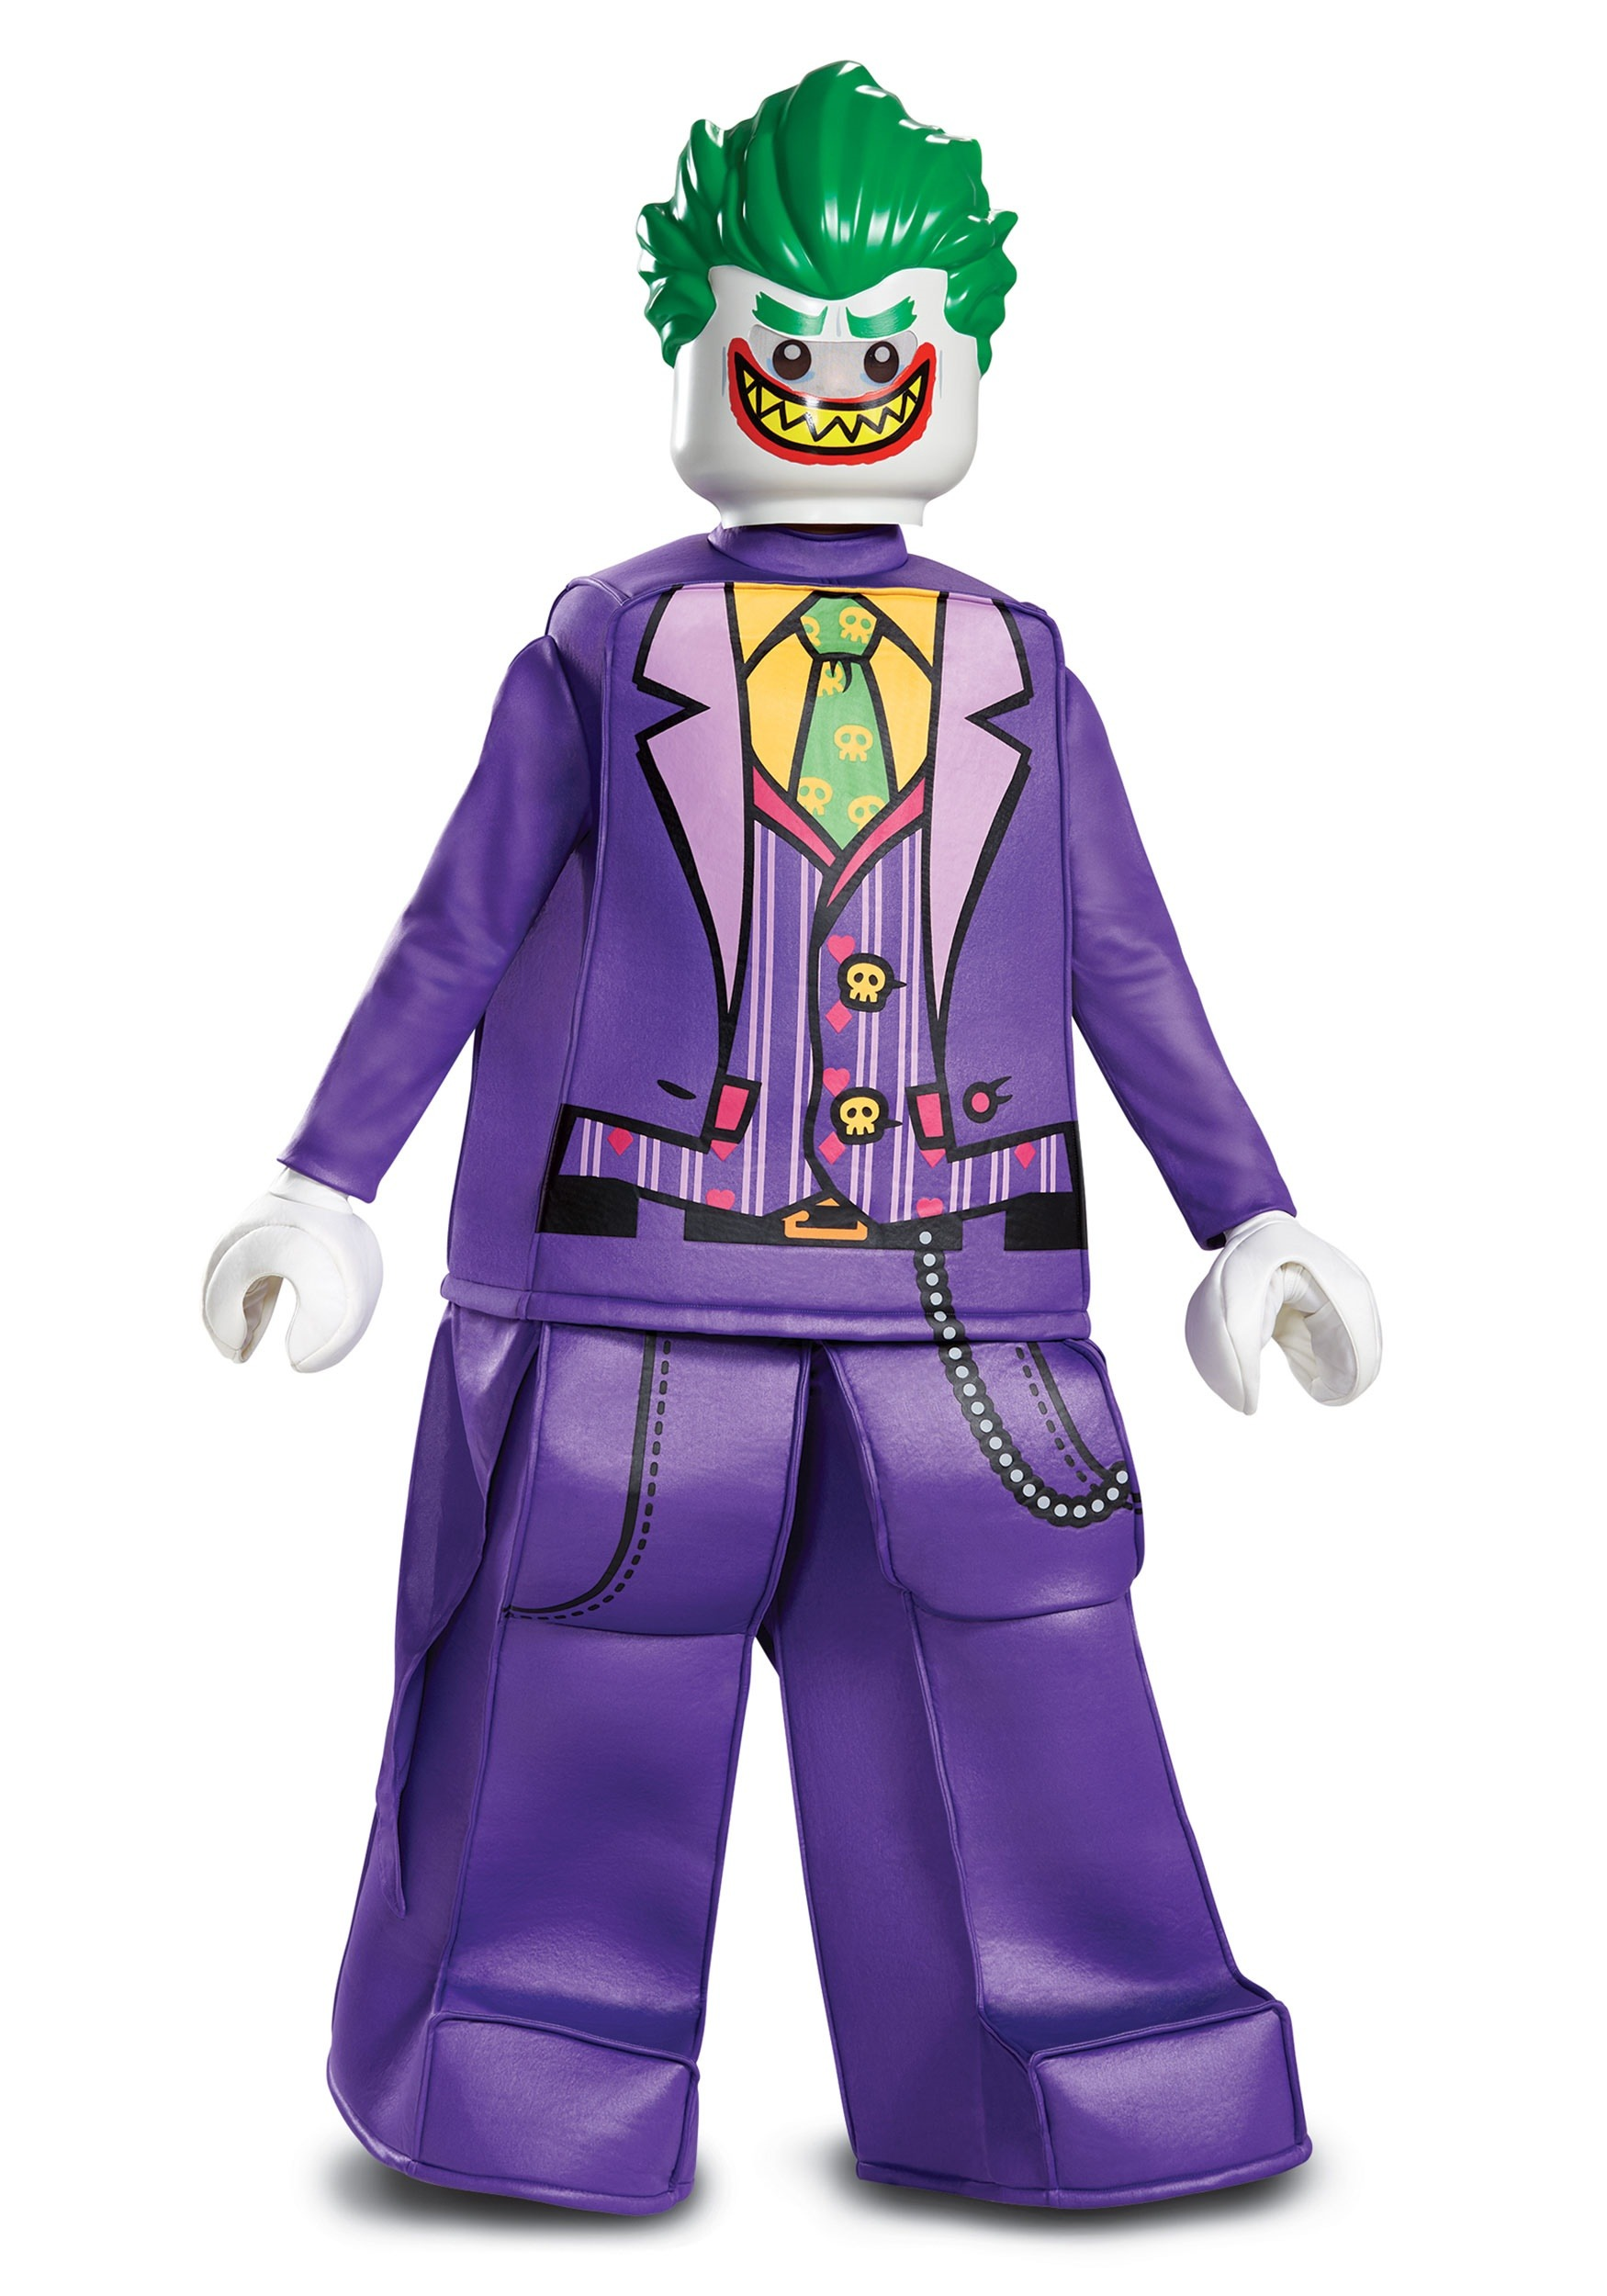 Batman Child Lego Prestige Joker Costume  sc 1 st  Halloween Costumes & Lego Batman Child Prestige Joker Costume